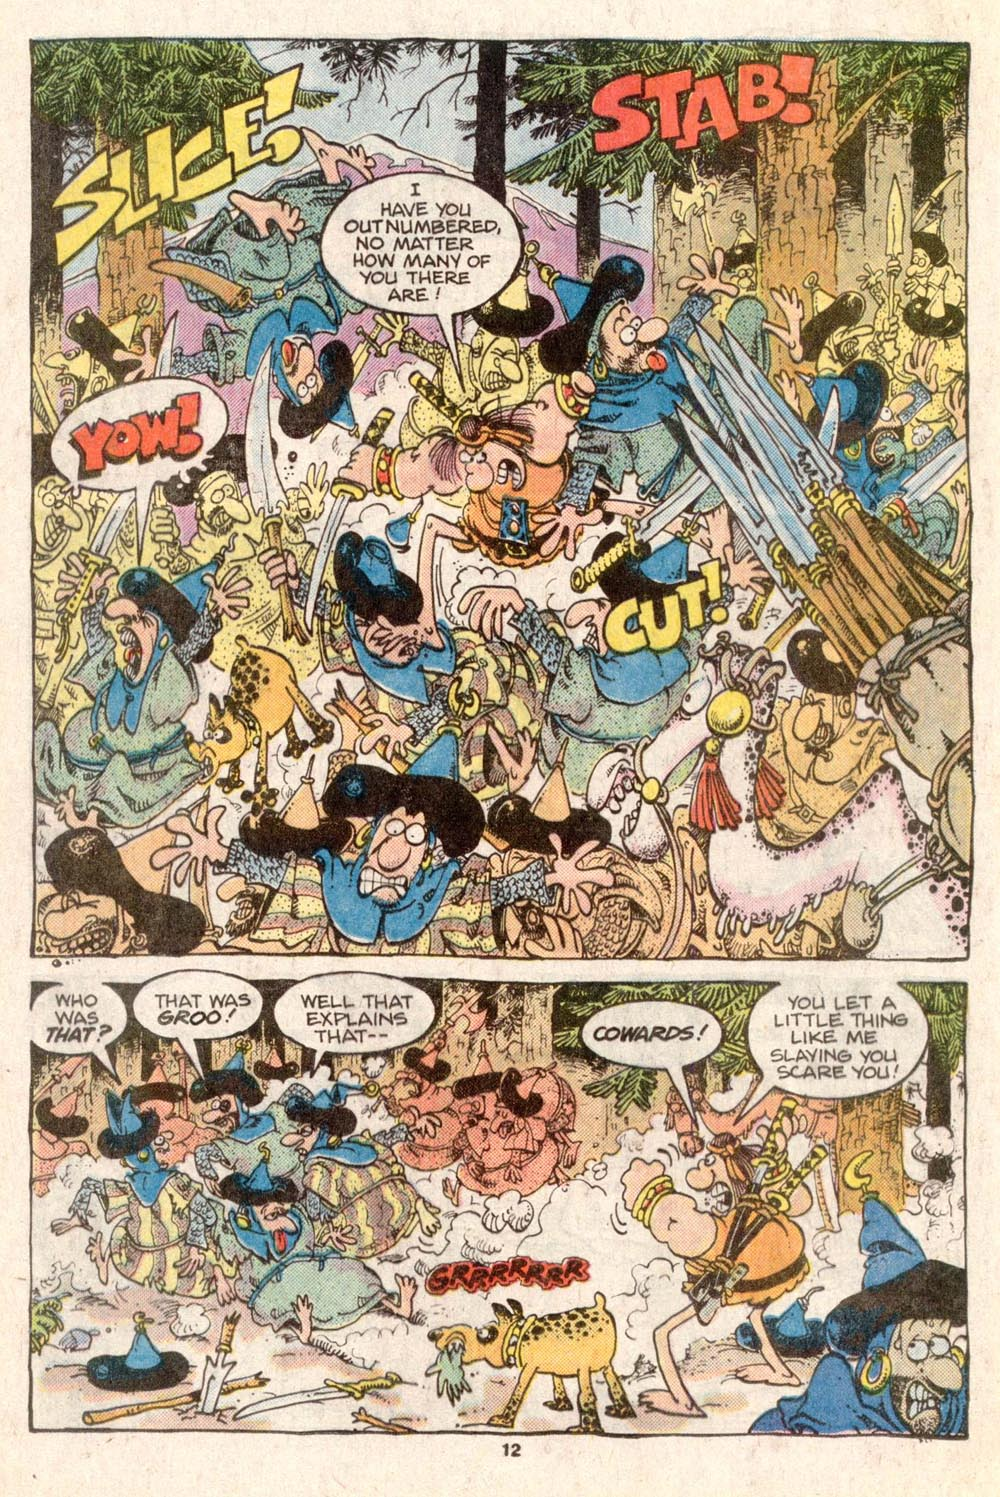 Read online Sergio Aragonés Groo the Wanderer comic -  Issue #31 - 11